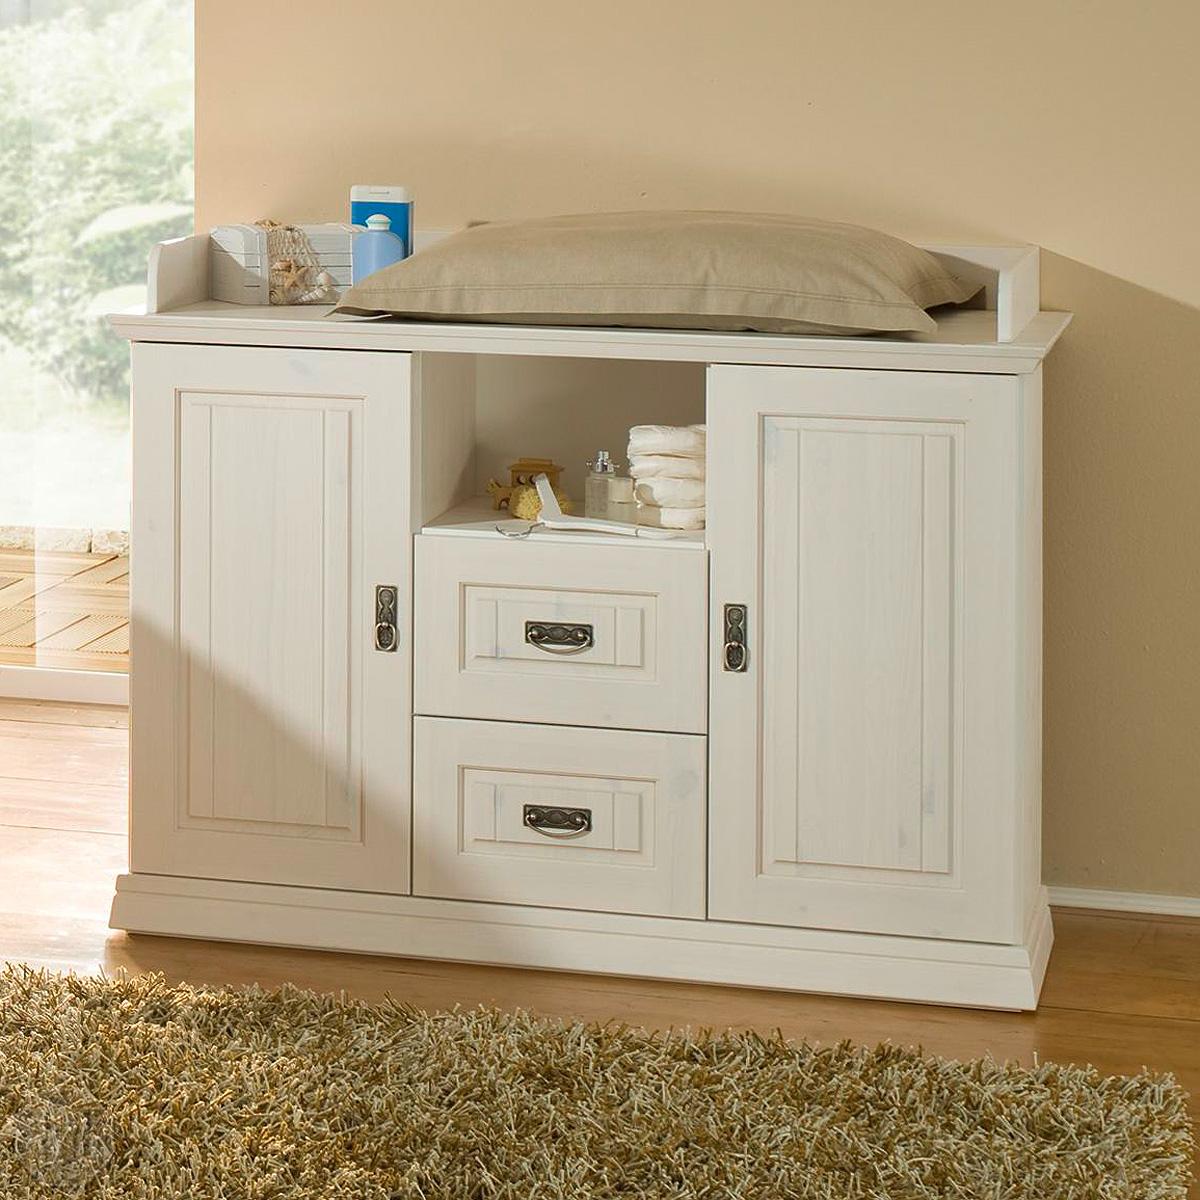 wickelkommode ronja in wei massiv babyzimmer ebay. Black Bedroom Furniture Sets. Home Design Ideas